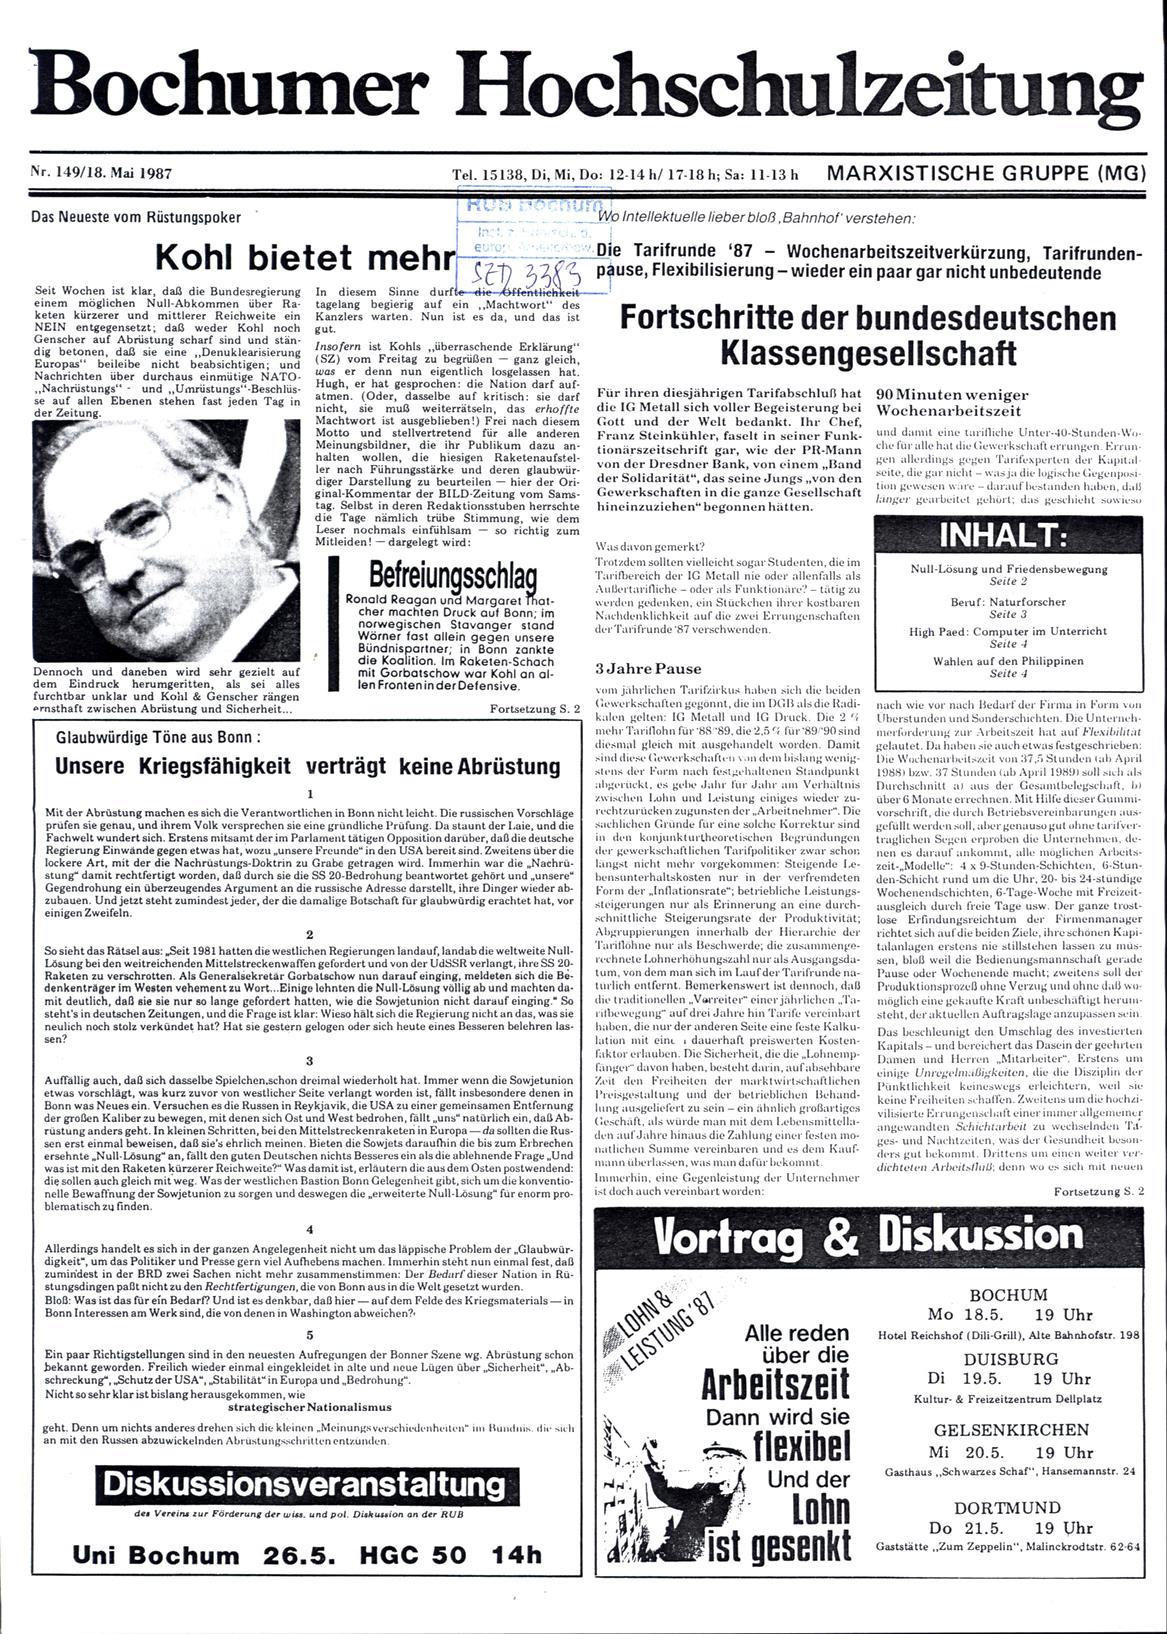 Bochum_BHZ_19870518_149_001